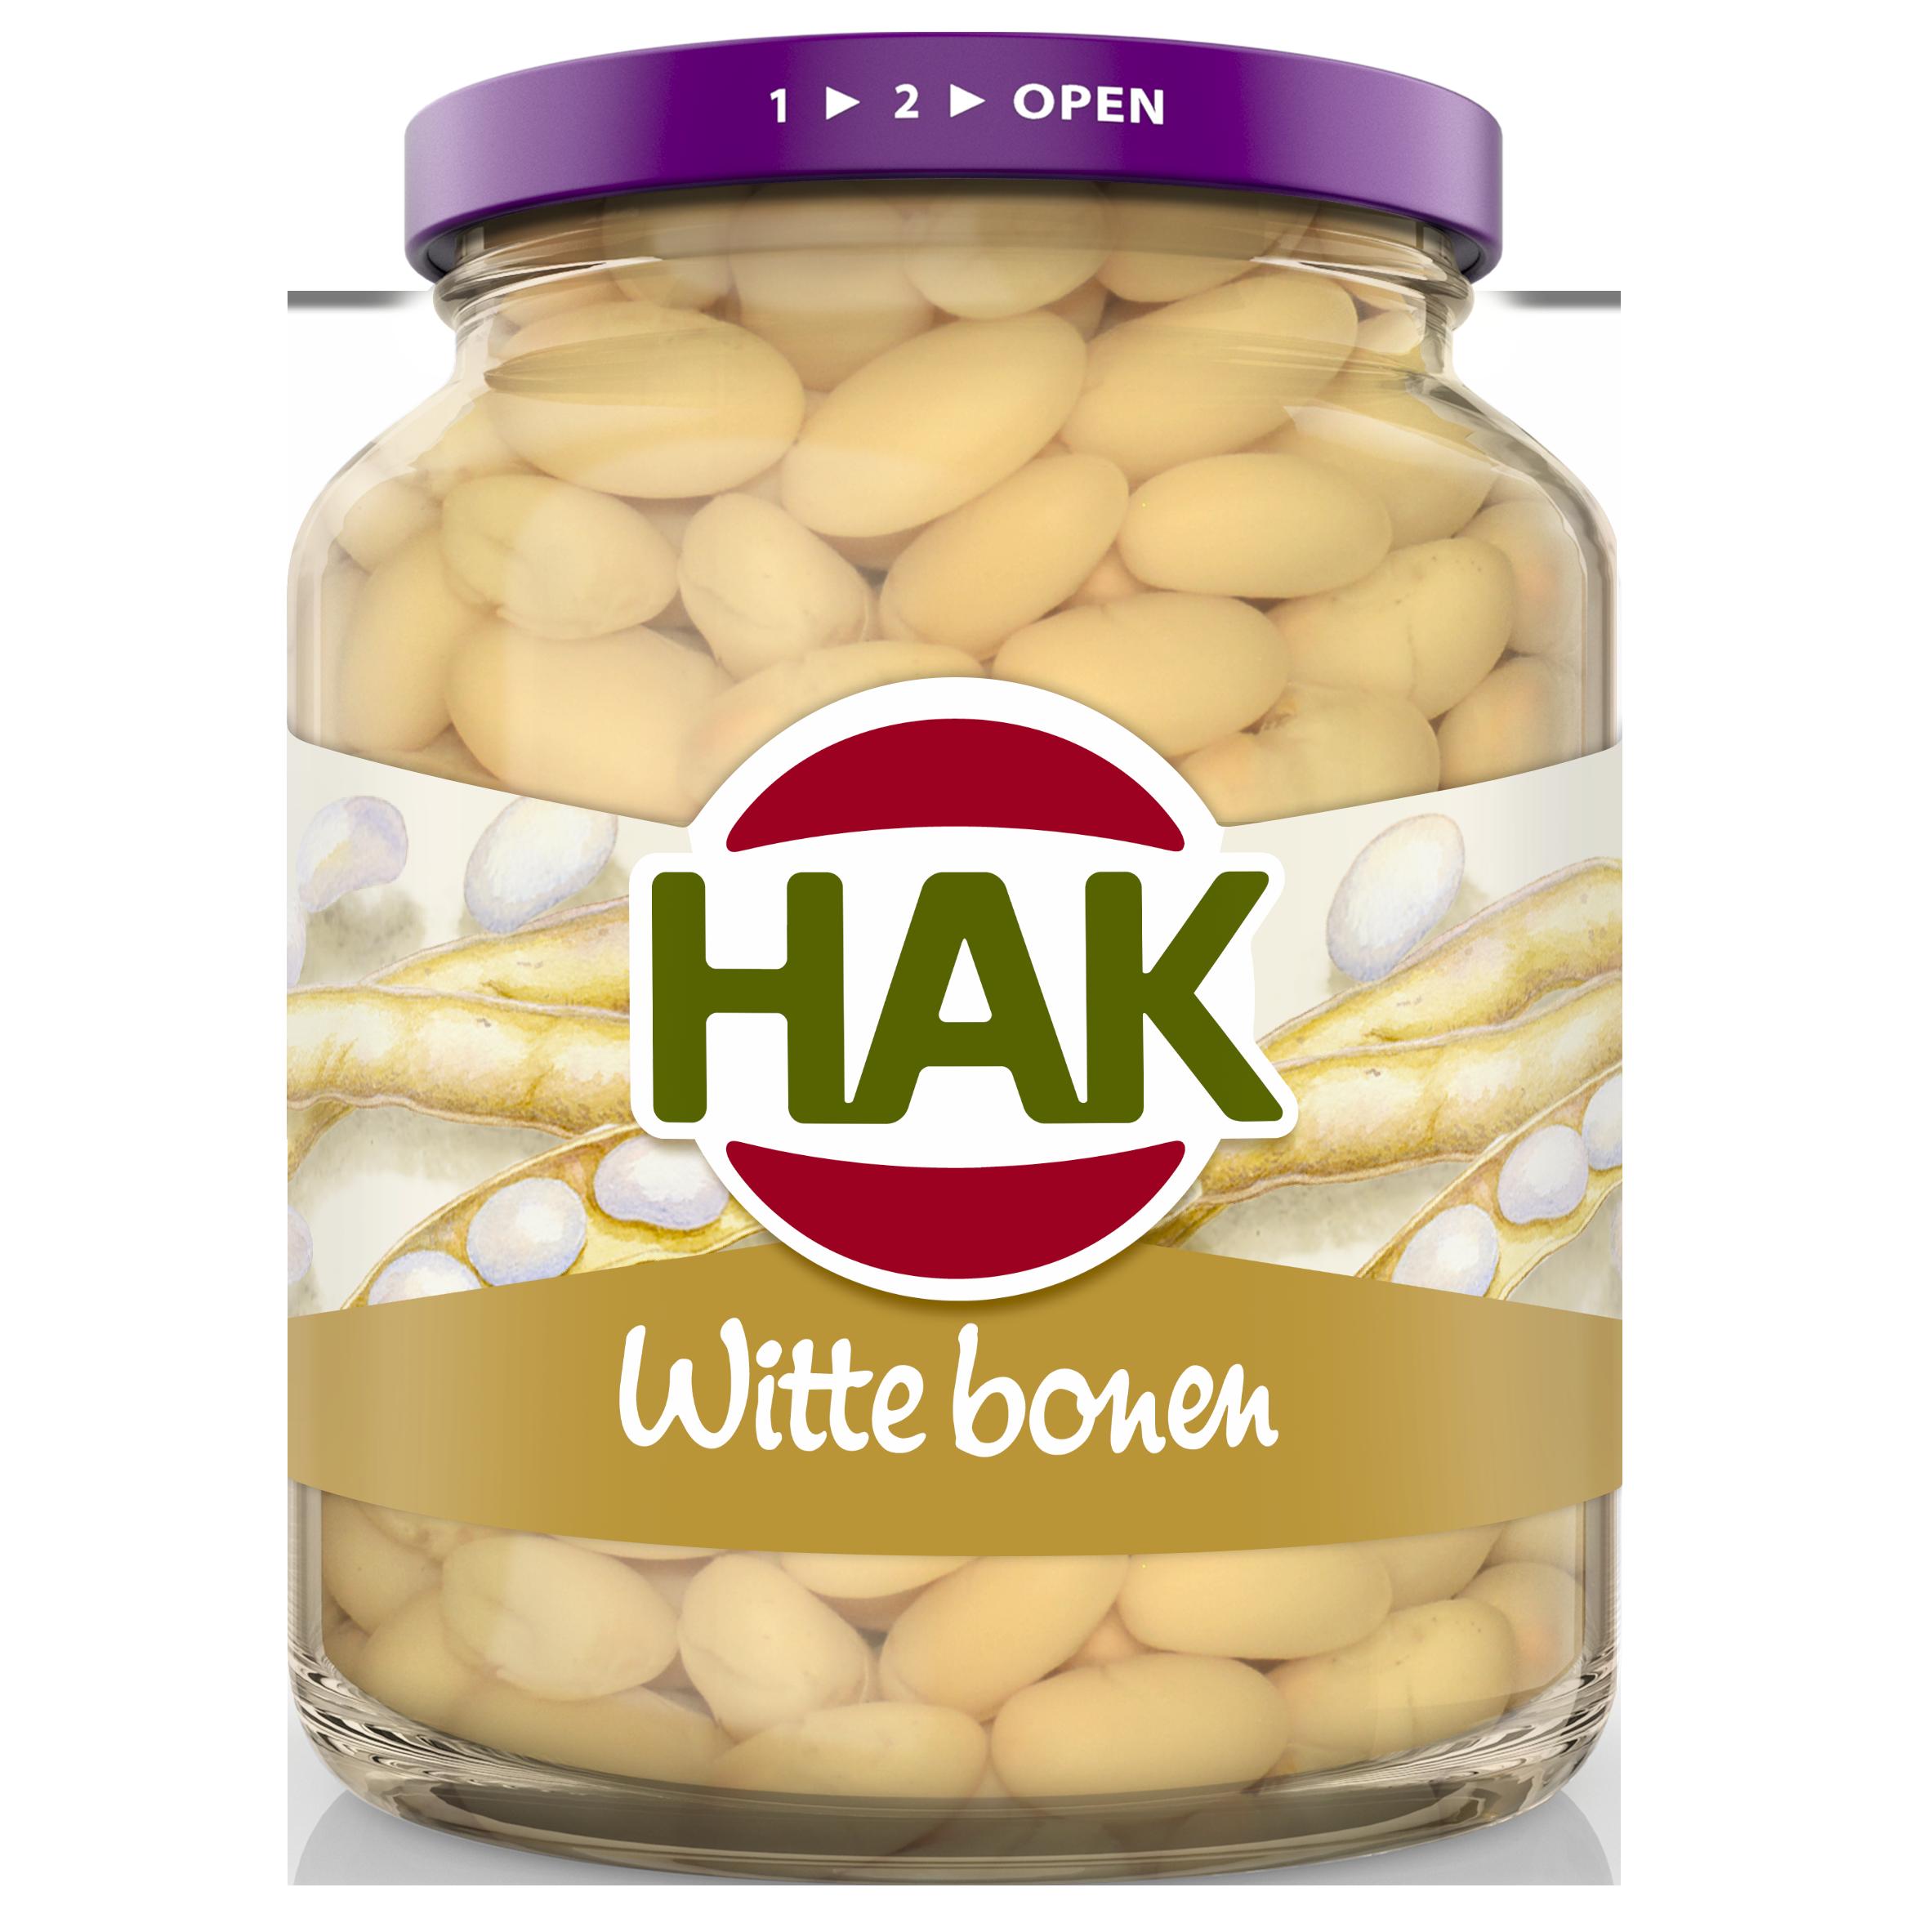 Hak Witte Bonen 370 Nl 8720600609022 1710129 Front